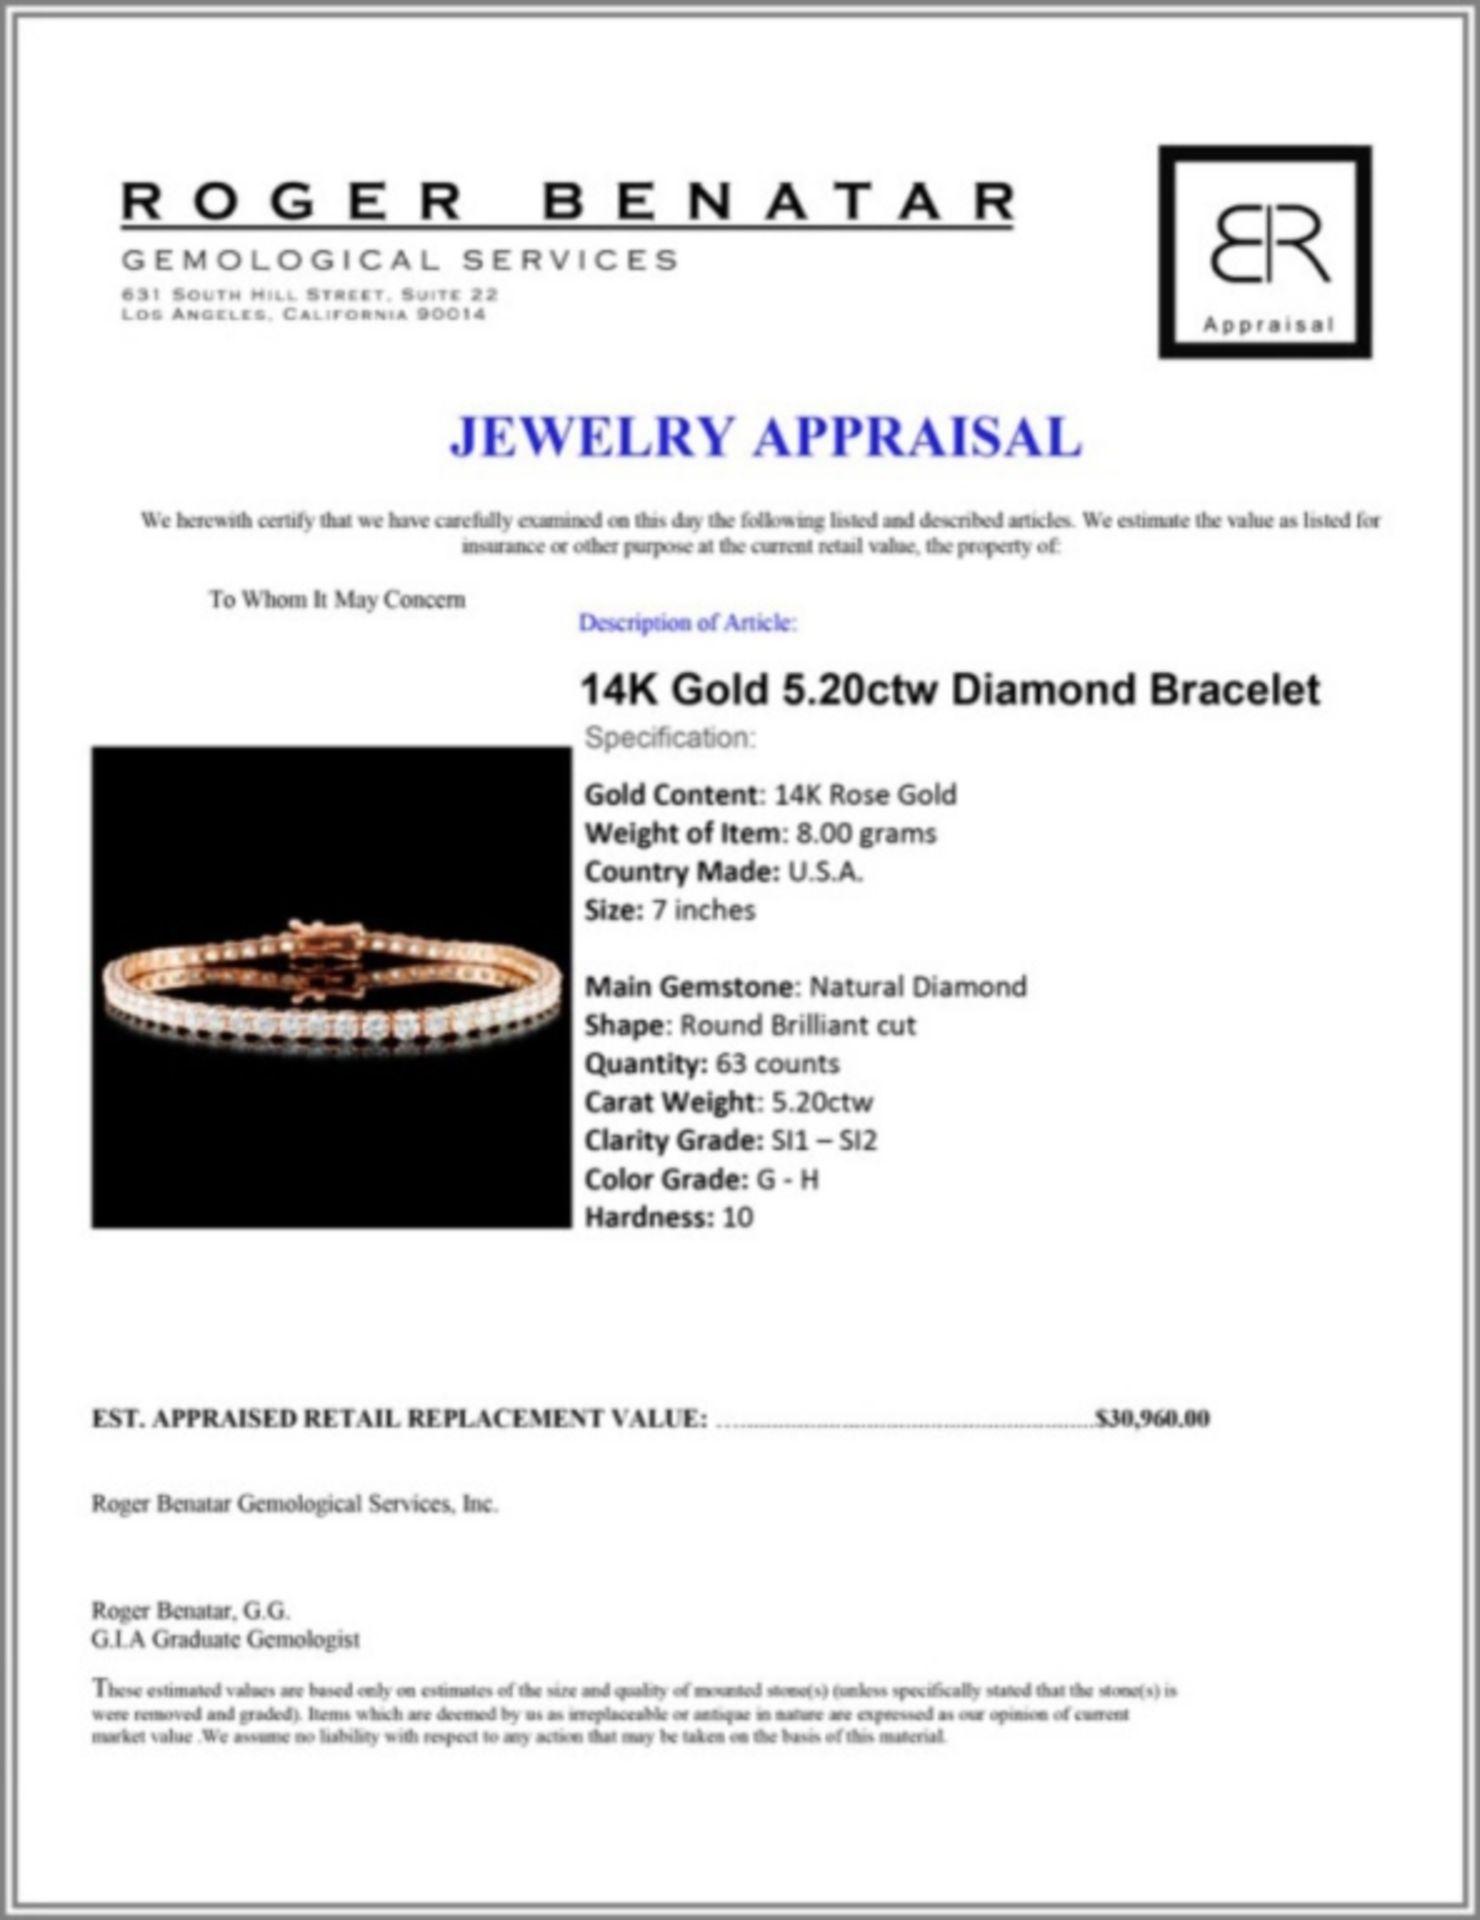 14K Gold 5.20ctw Diamond Bracelet - Image 3 of 3